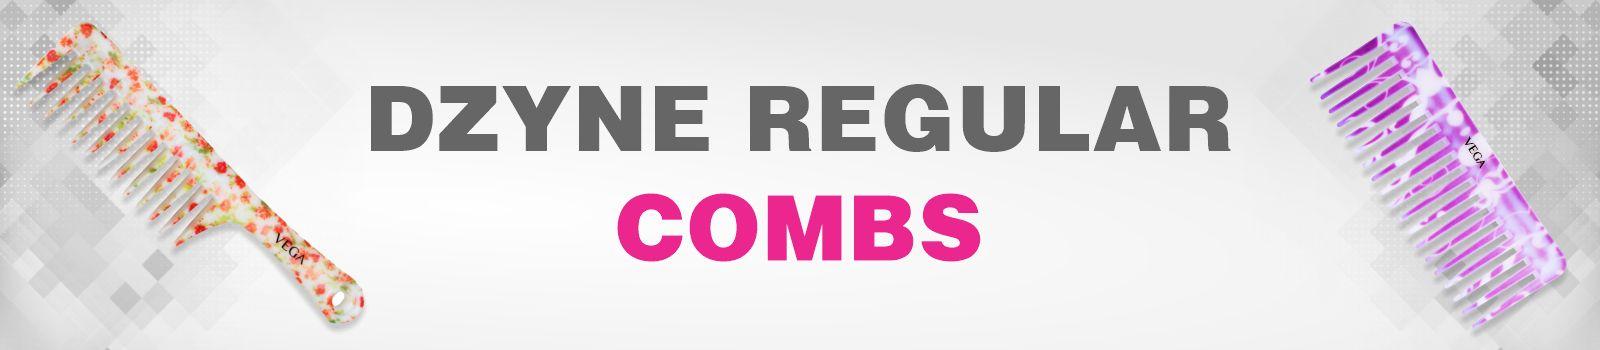 Dzyne Regular Combs